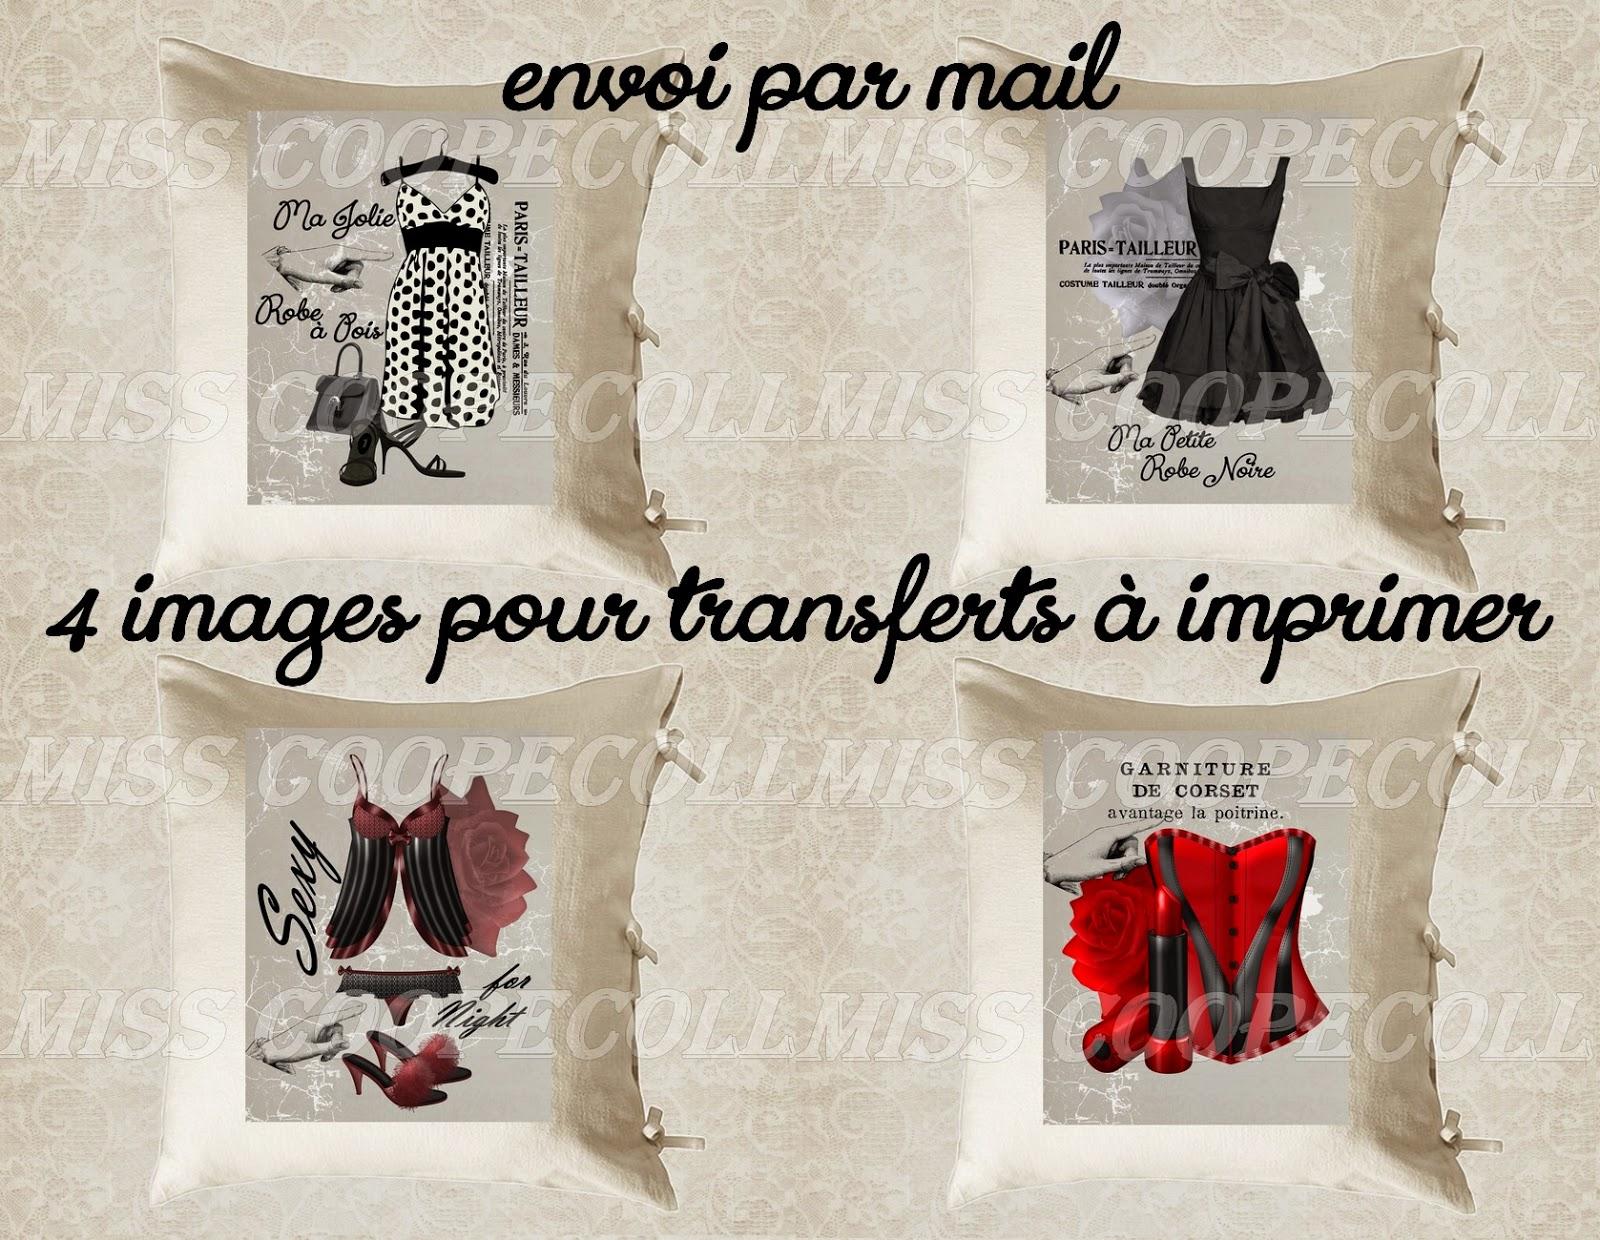 http://www.alittlemarket.com/loisirs-creatifs-scrapbooking/fr_4_images_digitales_pour_transfert_a_imprimer_ma_garde_robe2_envoi_par_mail_-8674331.html